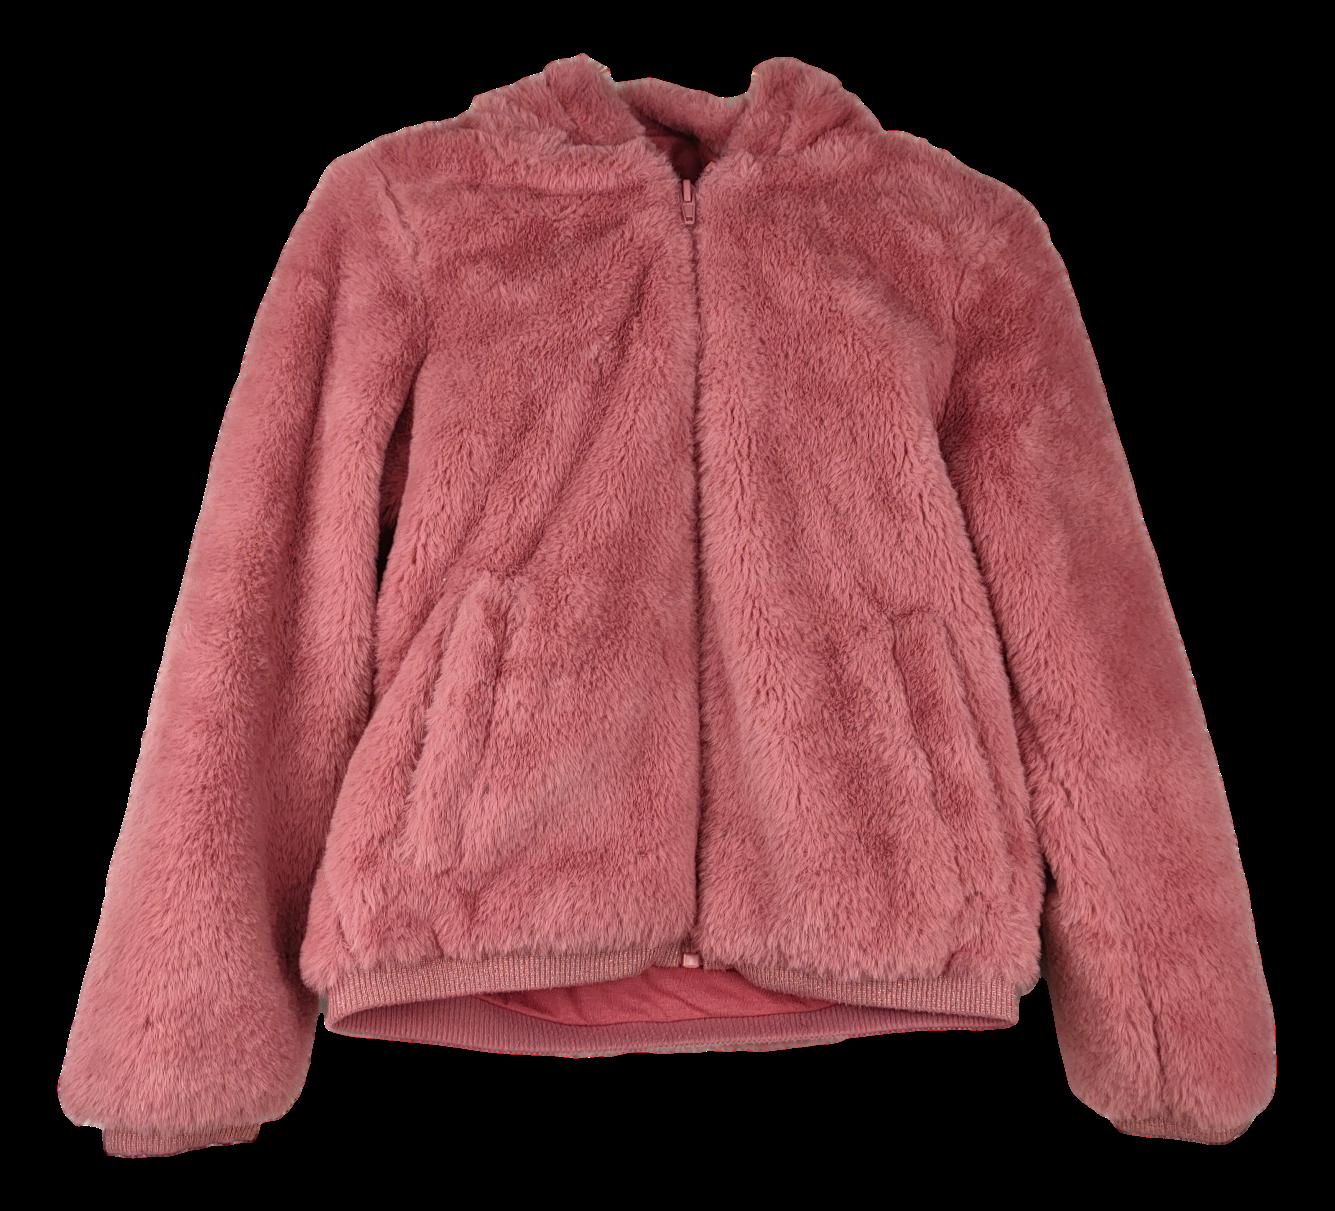 Manteau Kiabi -Taille 8 ans